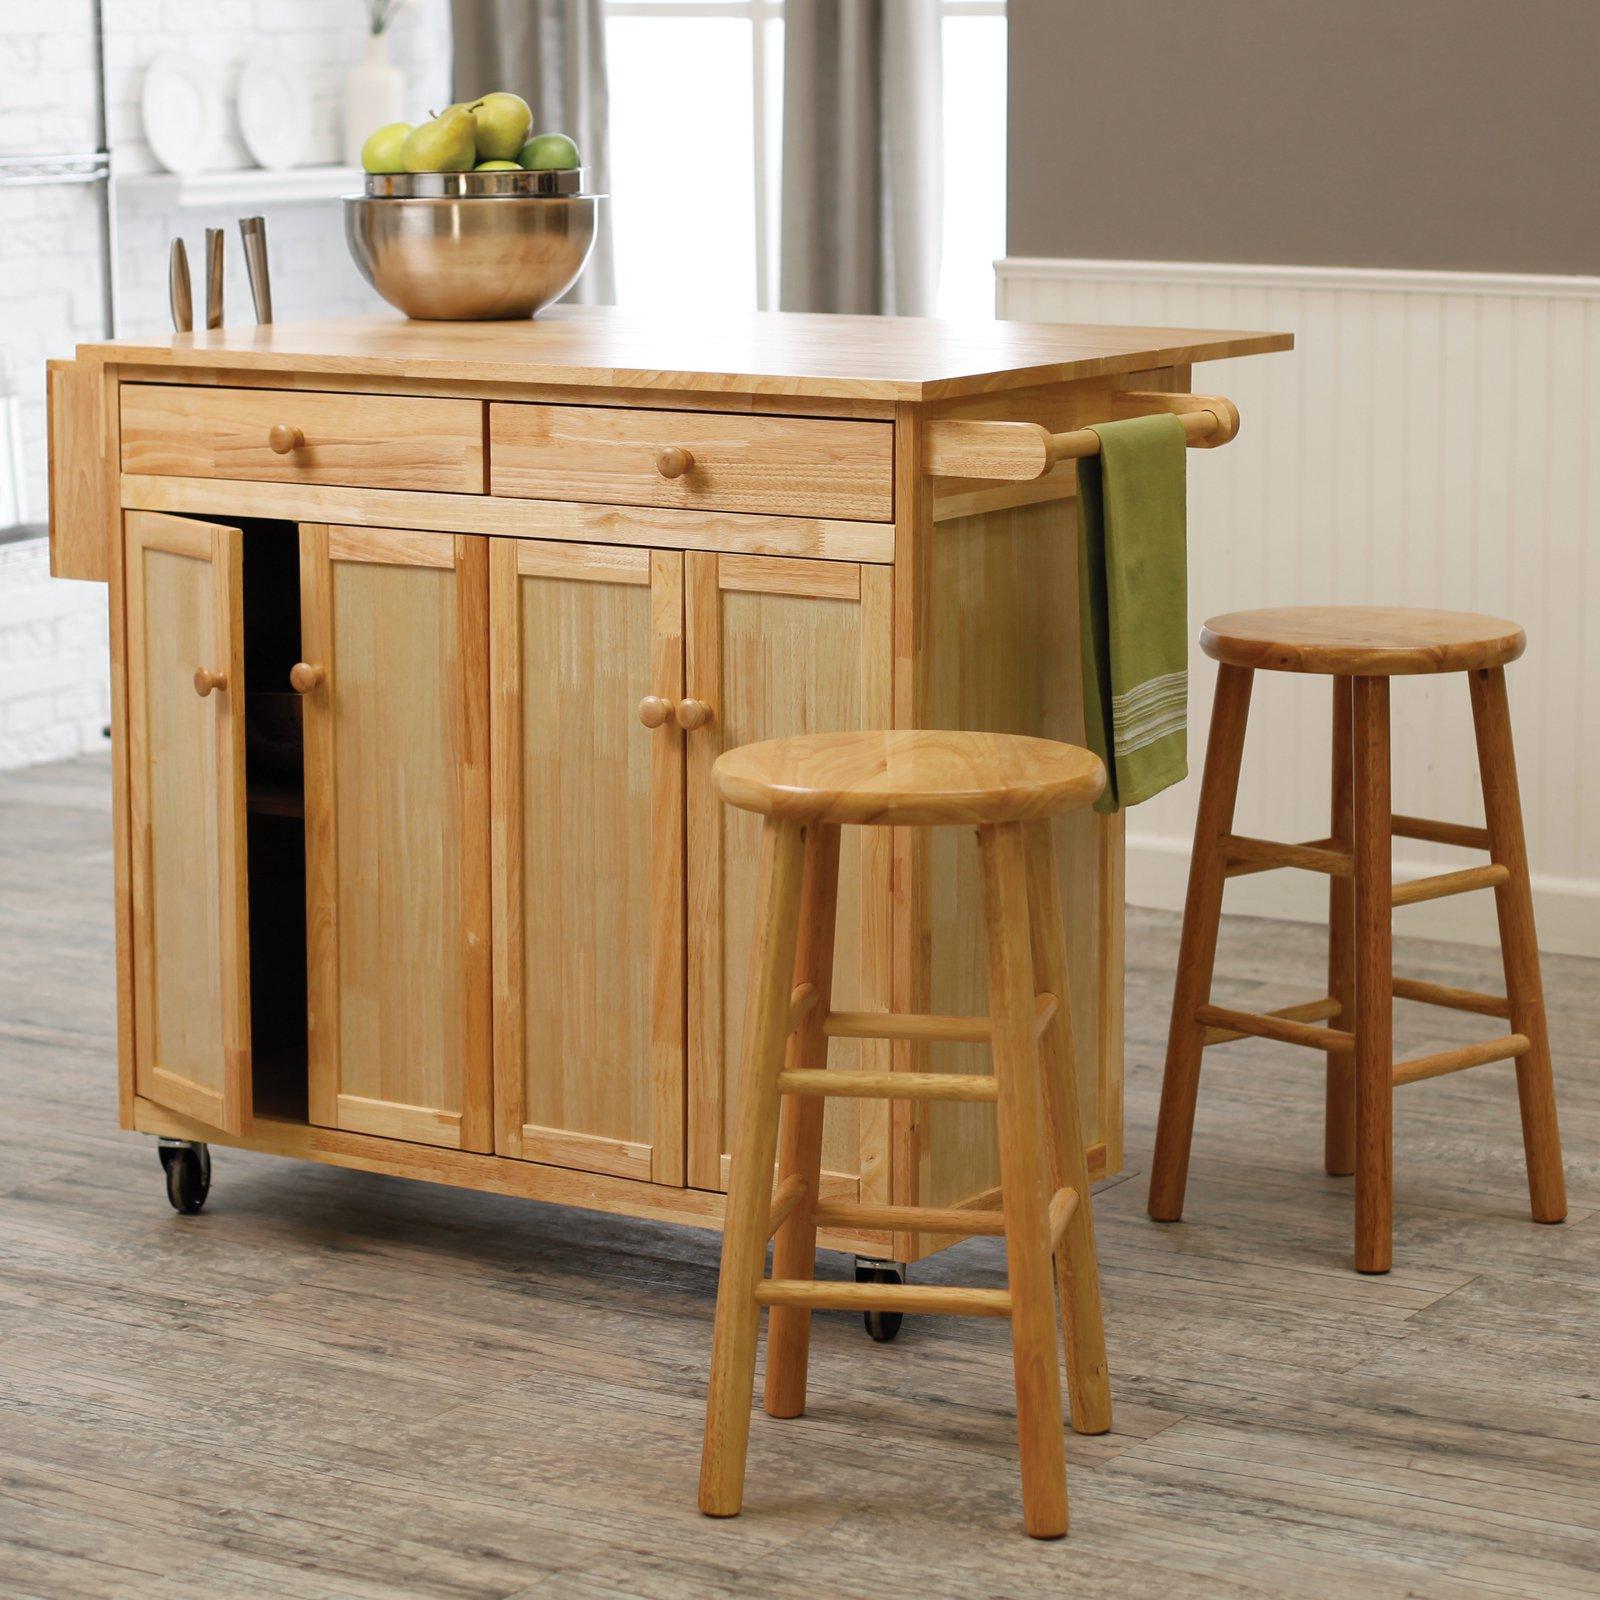 Kitchen island cabinet Photo - 12